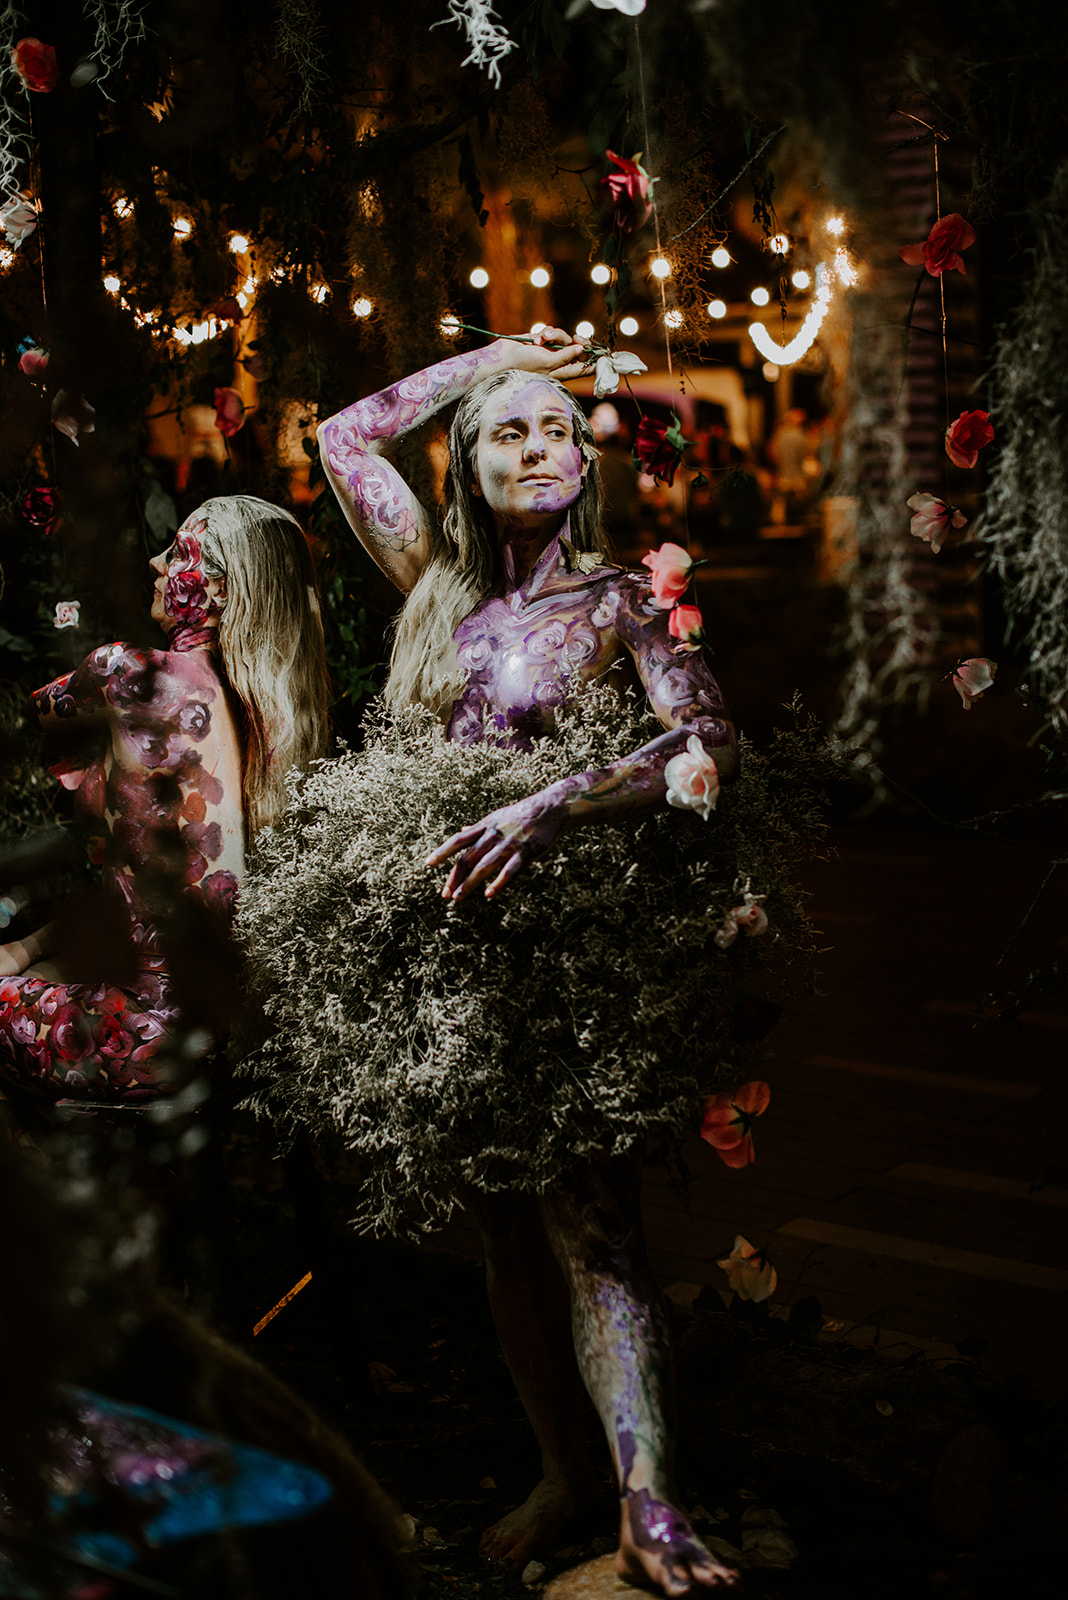 body-paint-live-art-installation.JPG